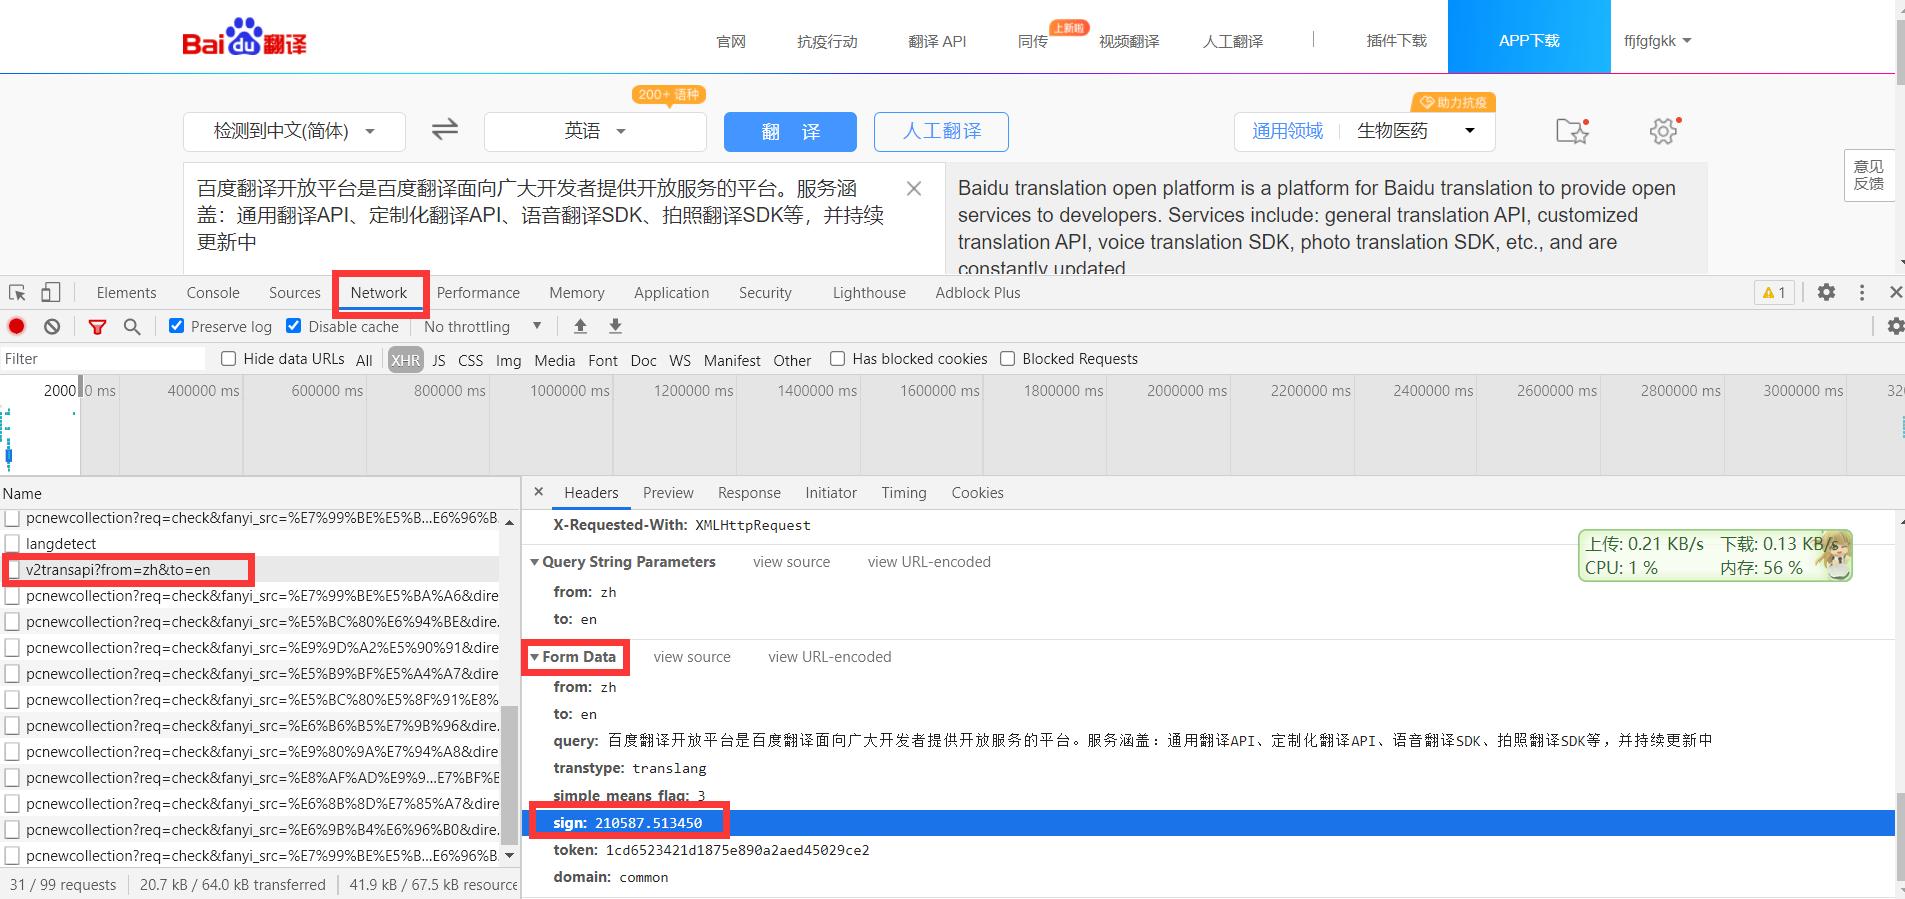 python实现百度翻译,调用js生成sign实现反爬